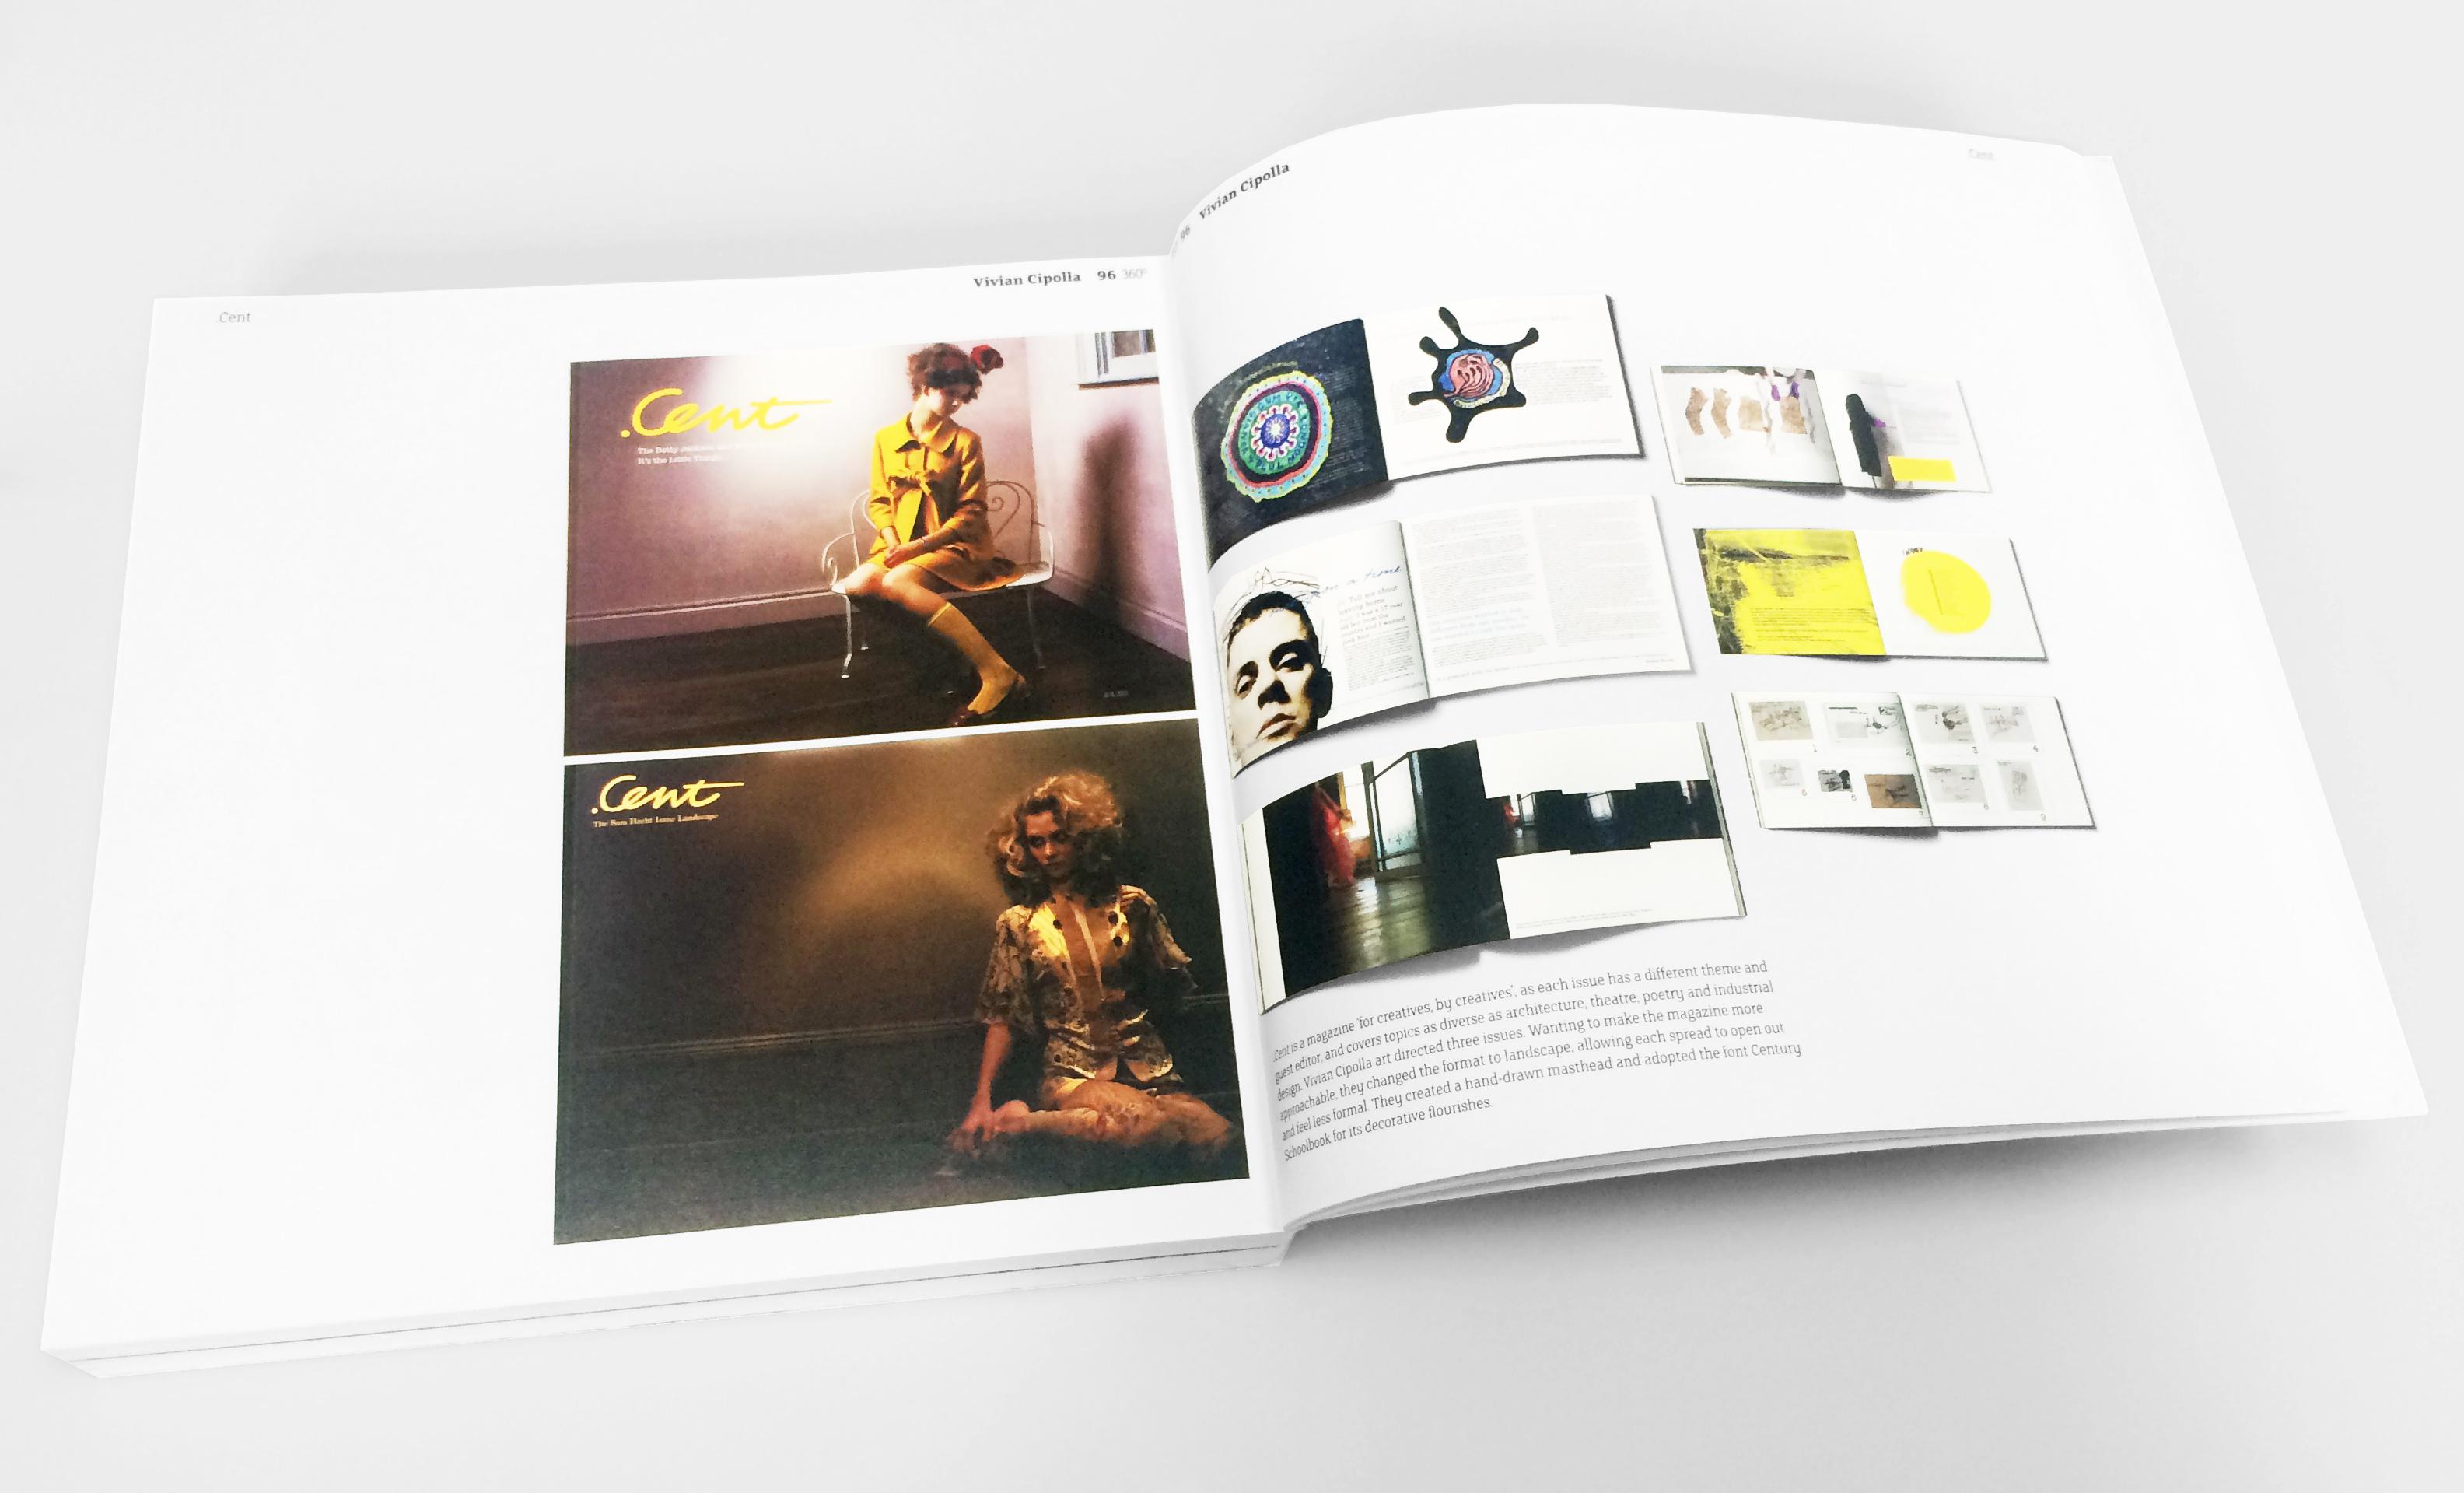 Cent Magazine in Onehundredat360°: Graphic Design's New Global Generation